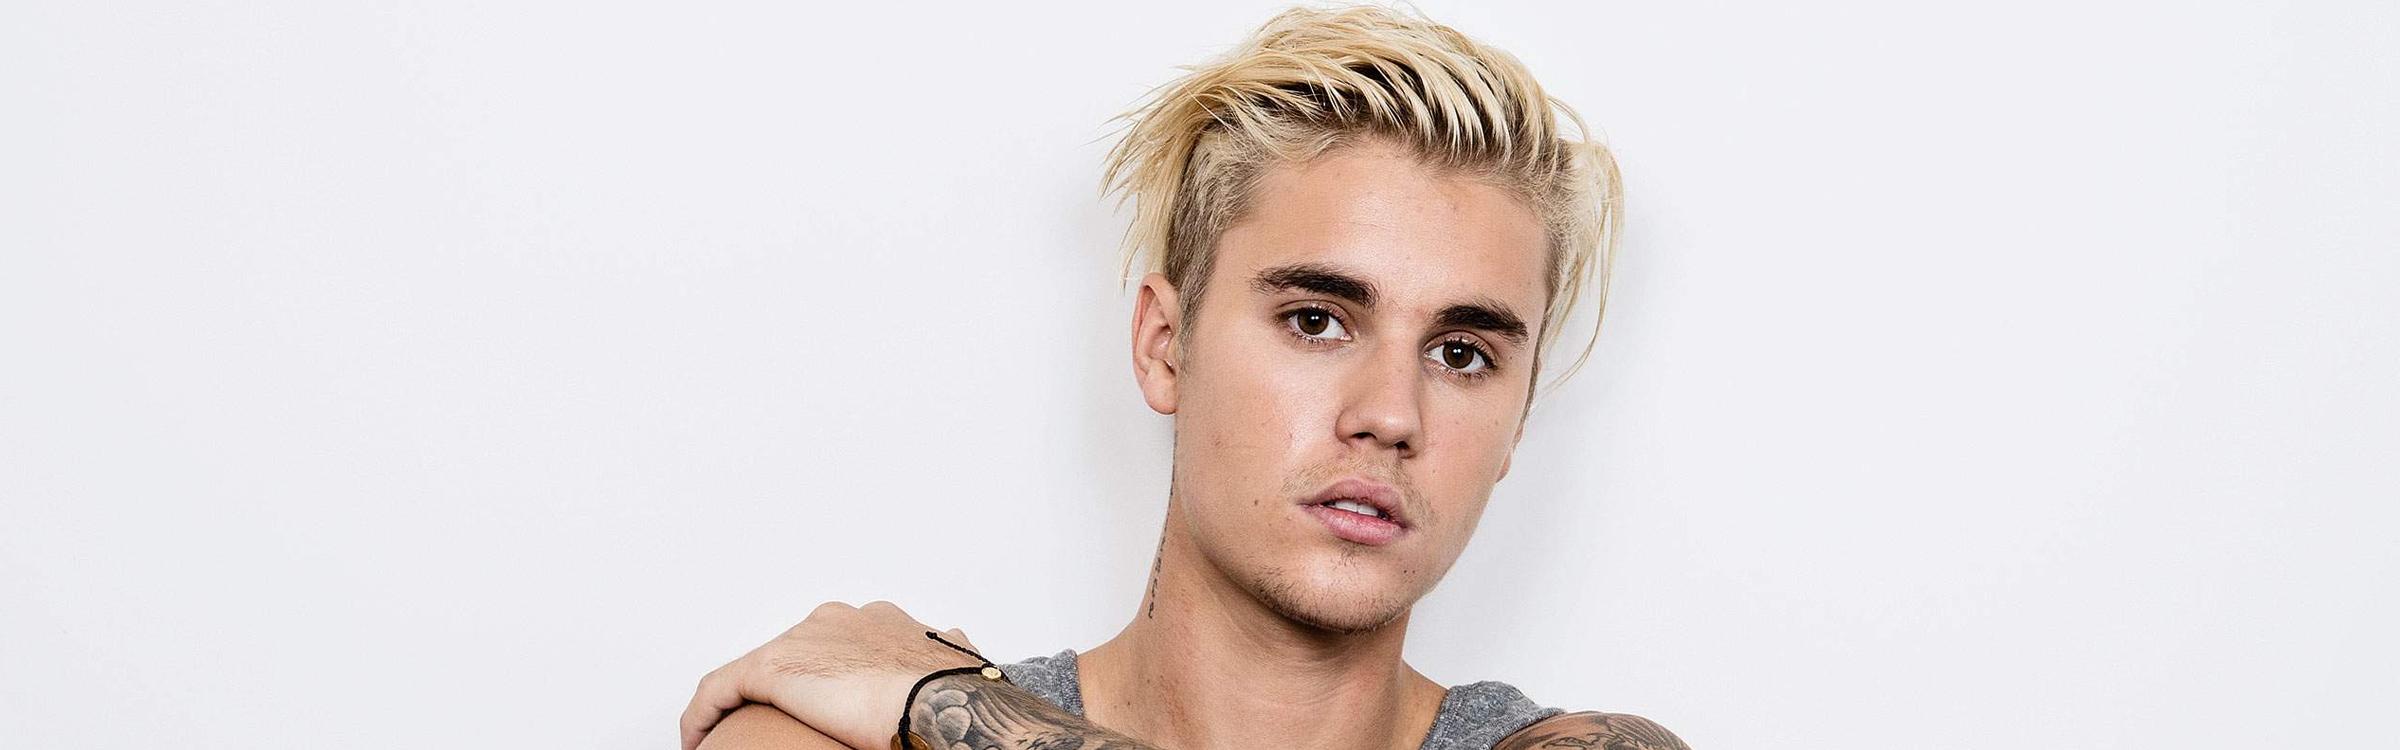 Justin forever21 header